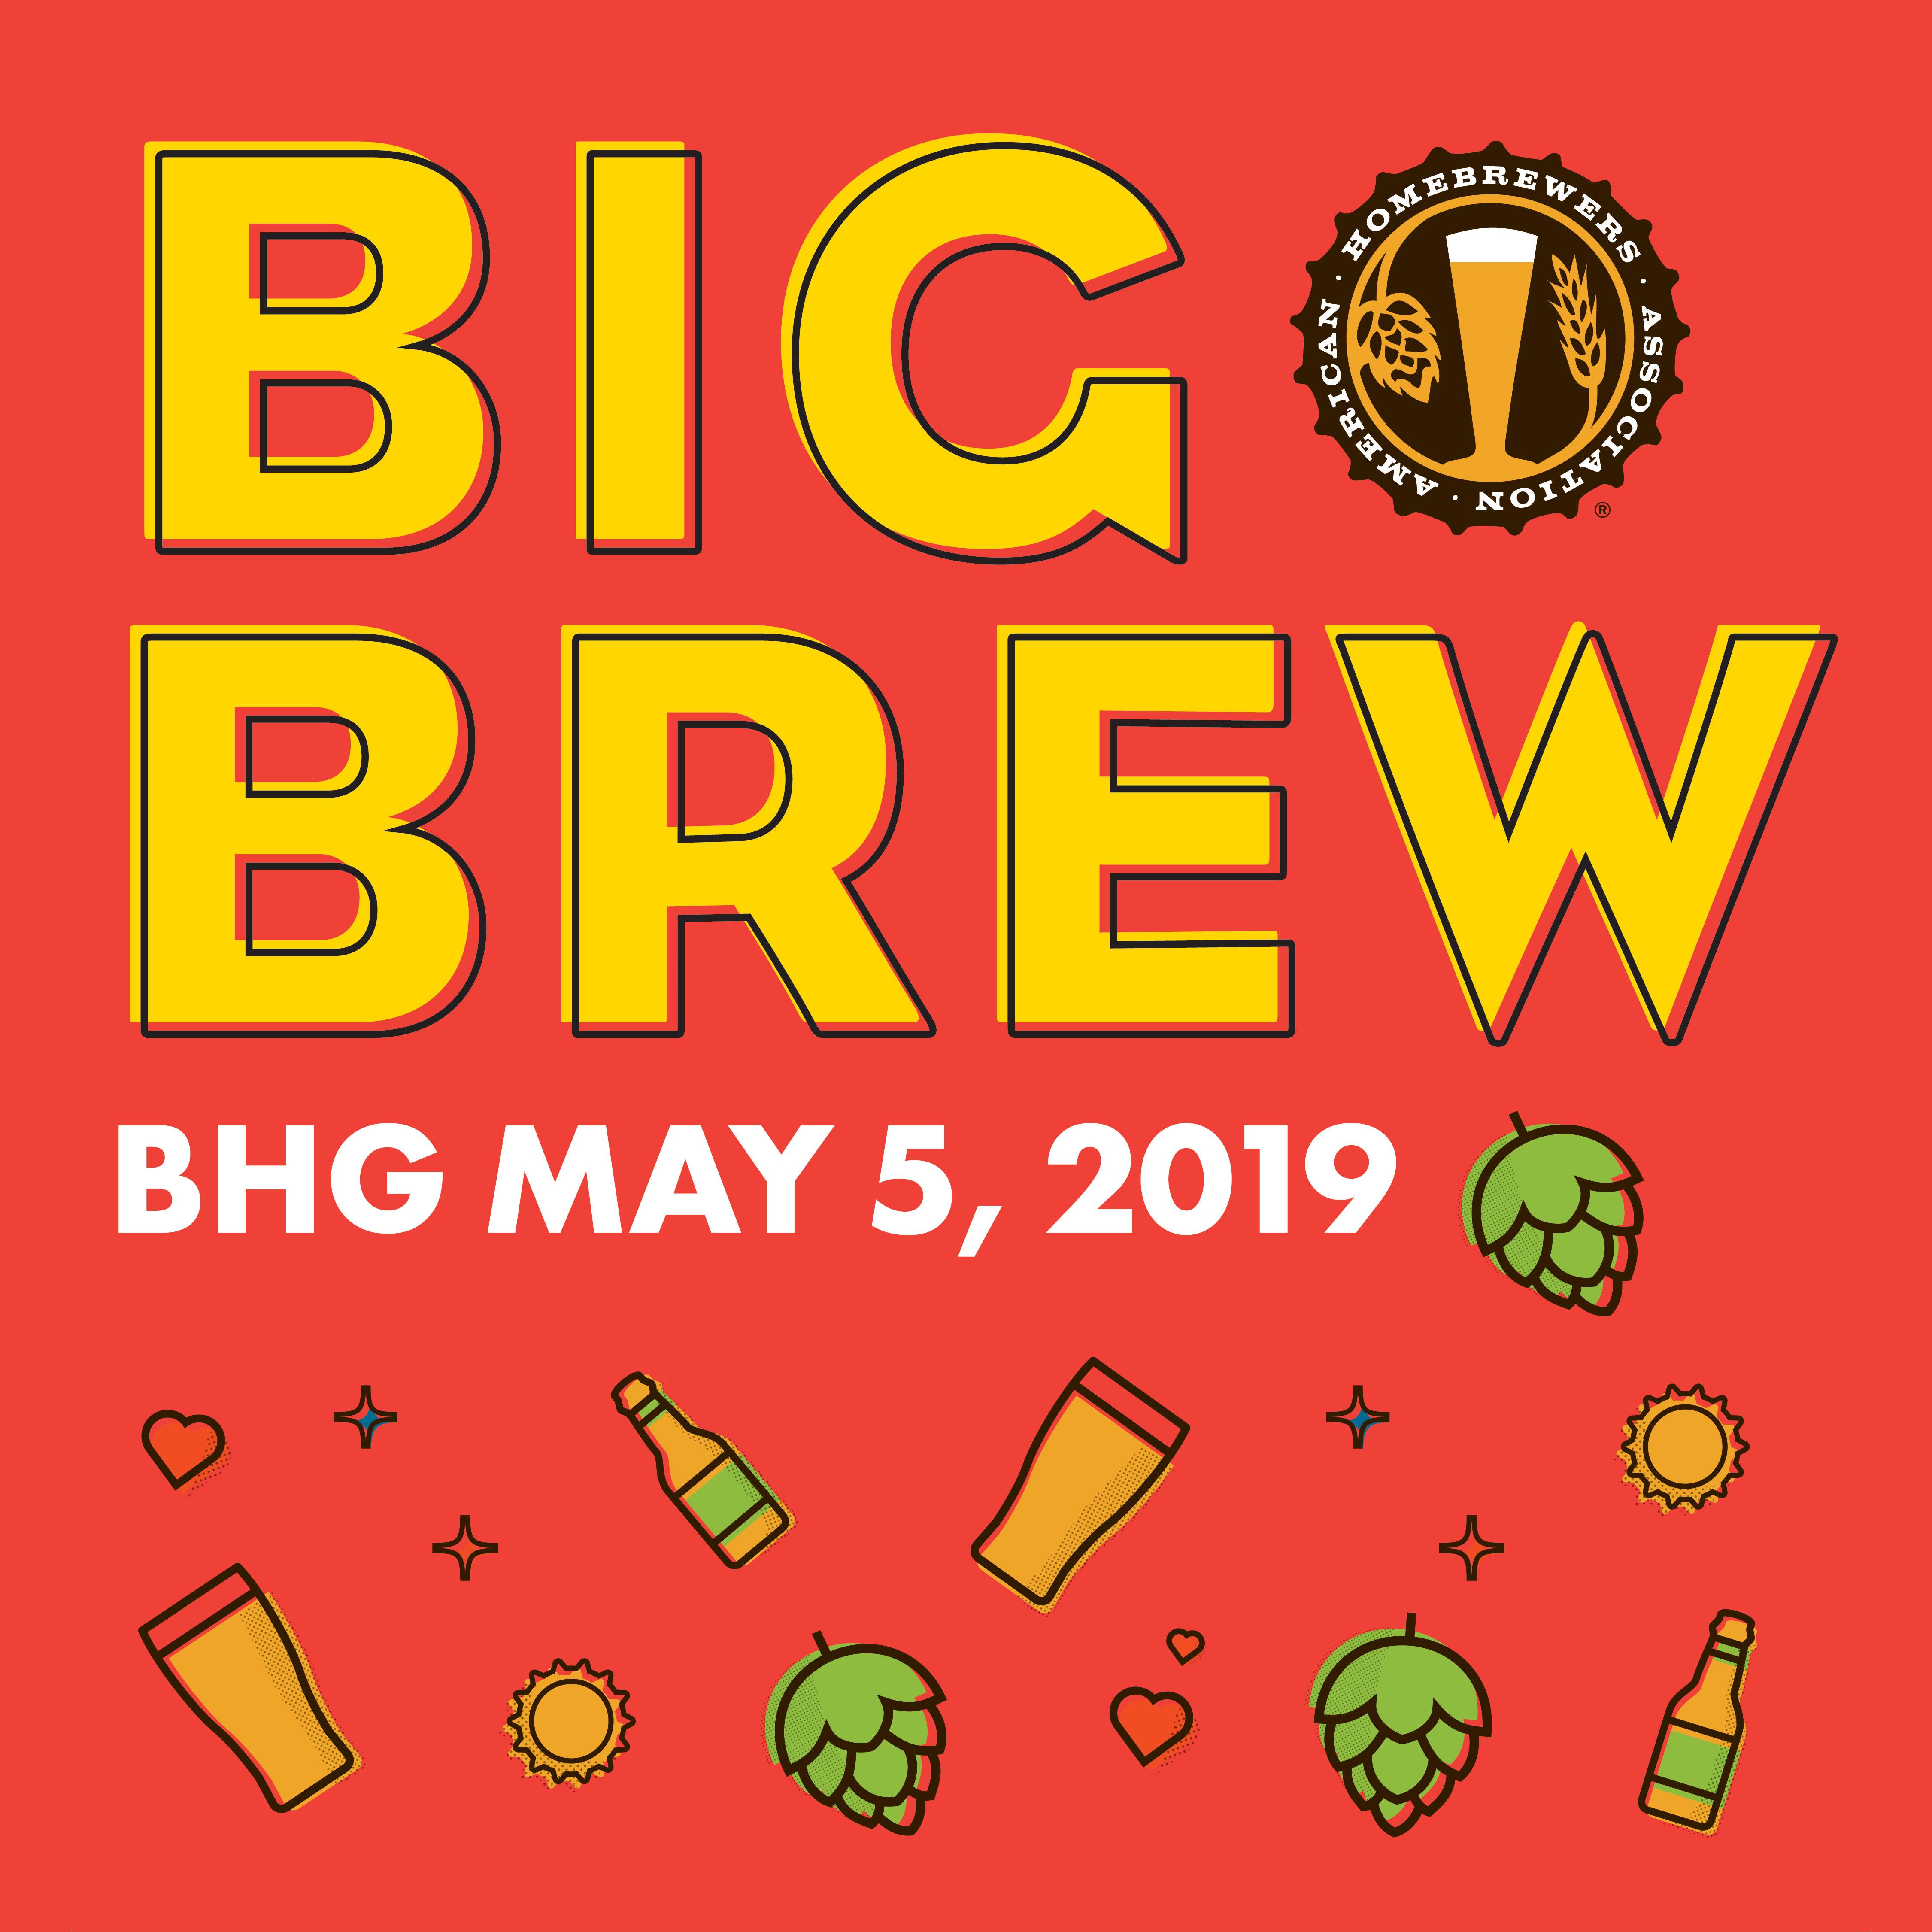 2019 BHG Big Brew